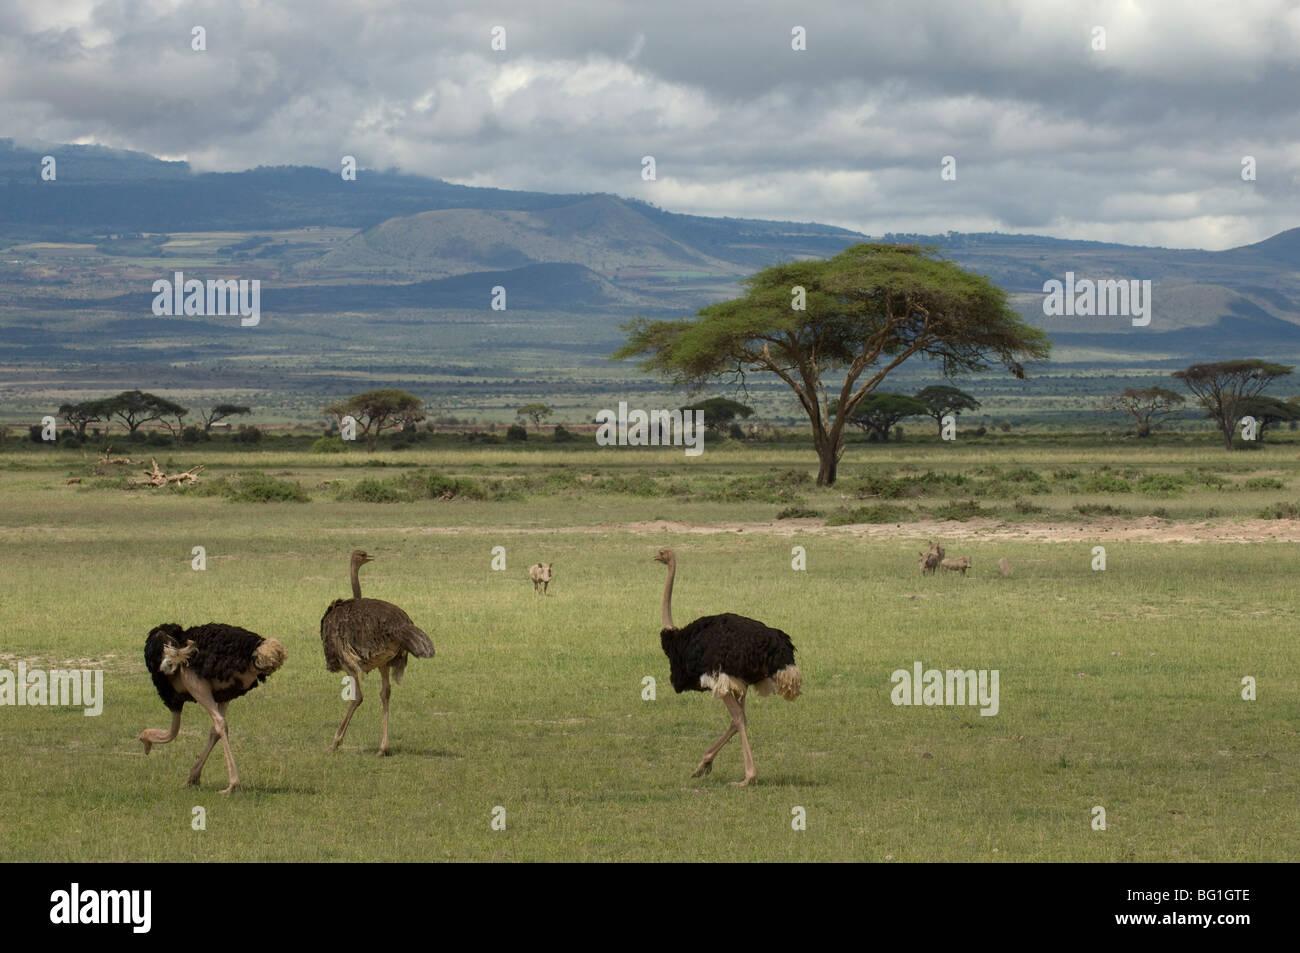 Ostrich, Amboseli National Park, Kenya, East Africa, Africa - Stock Image